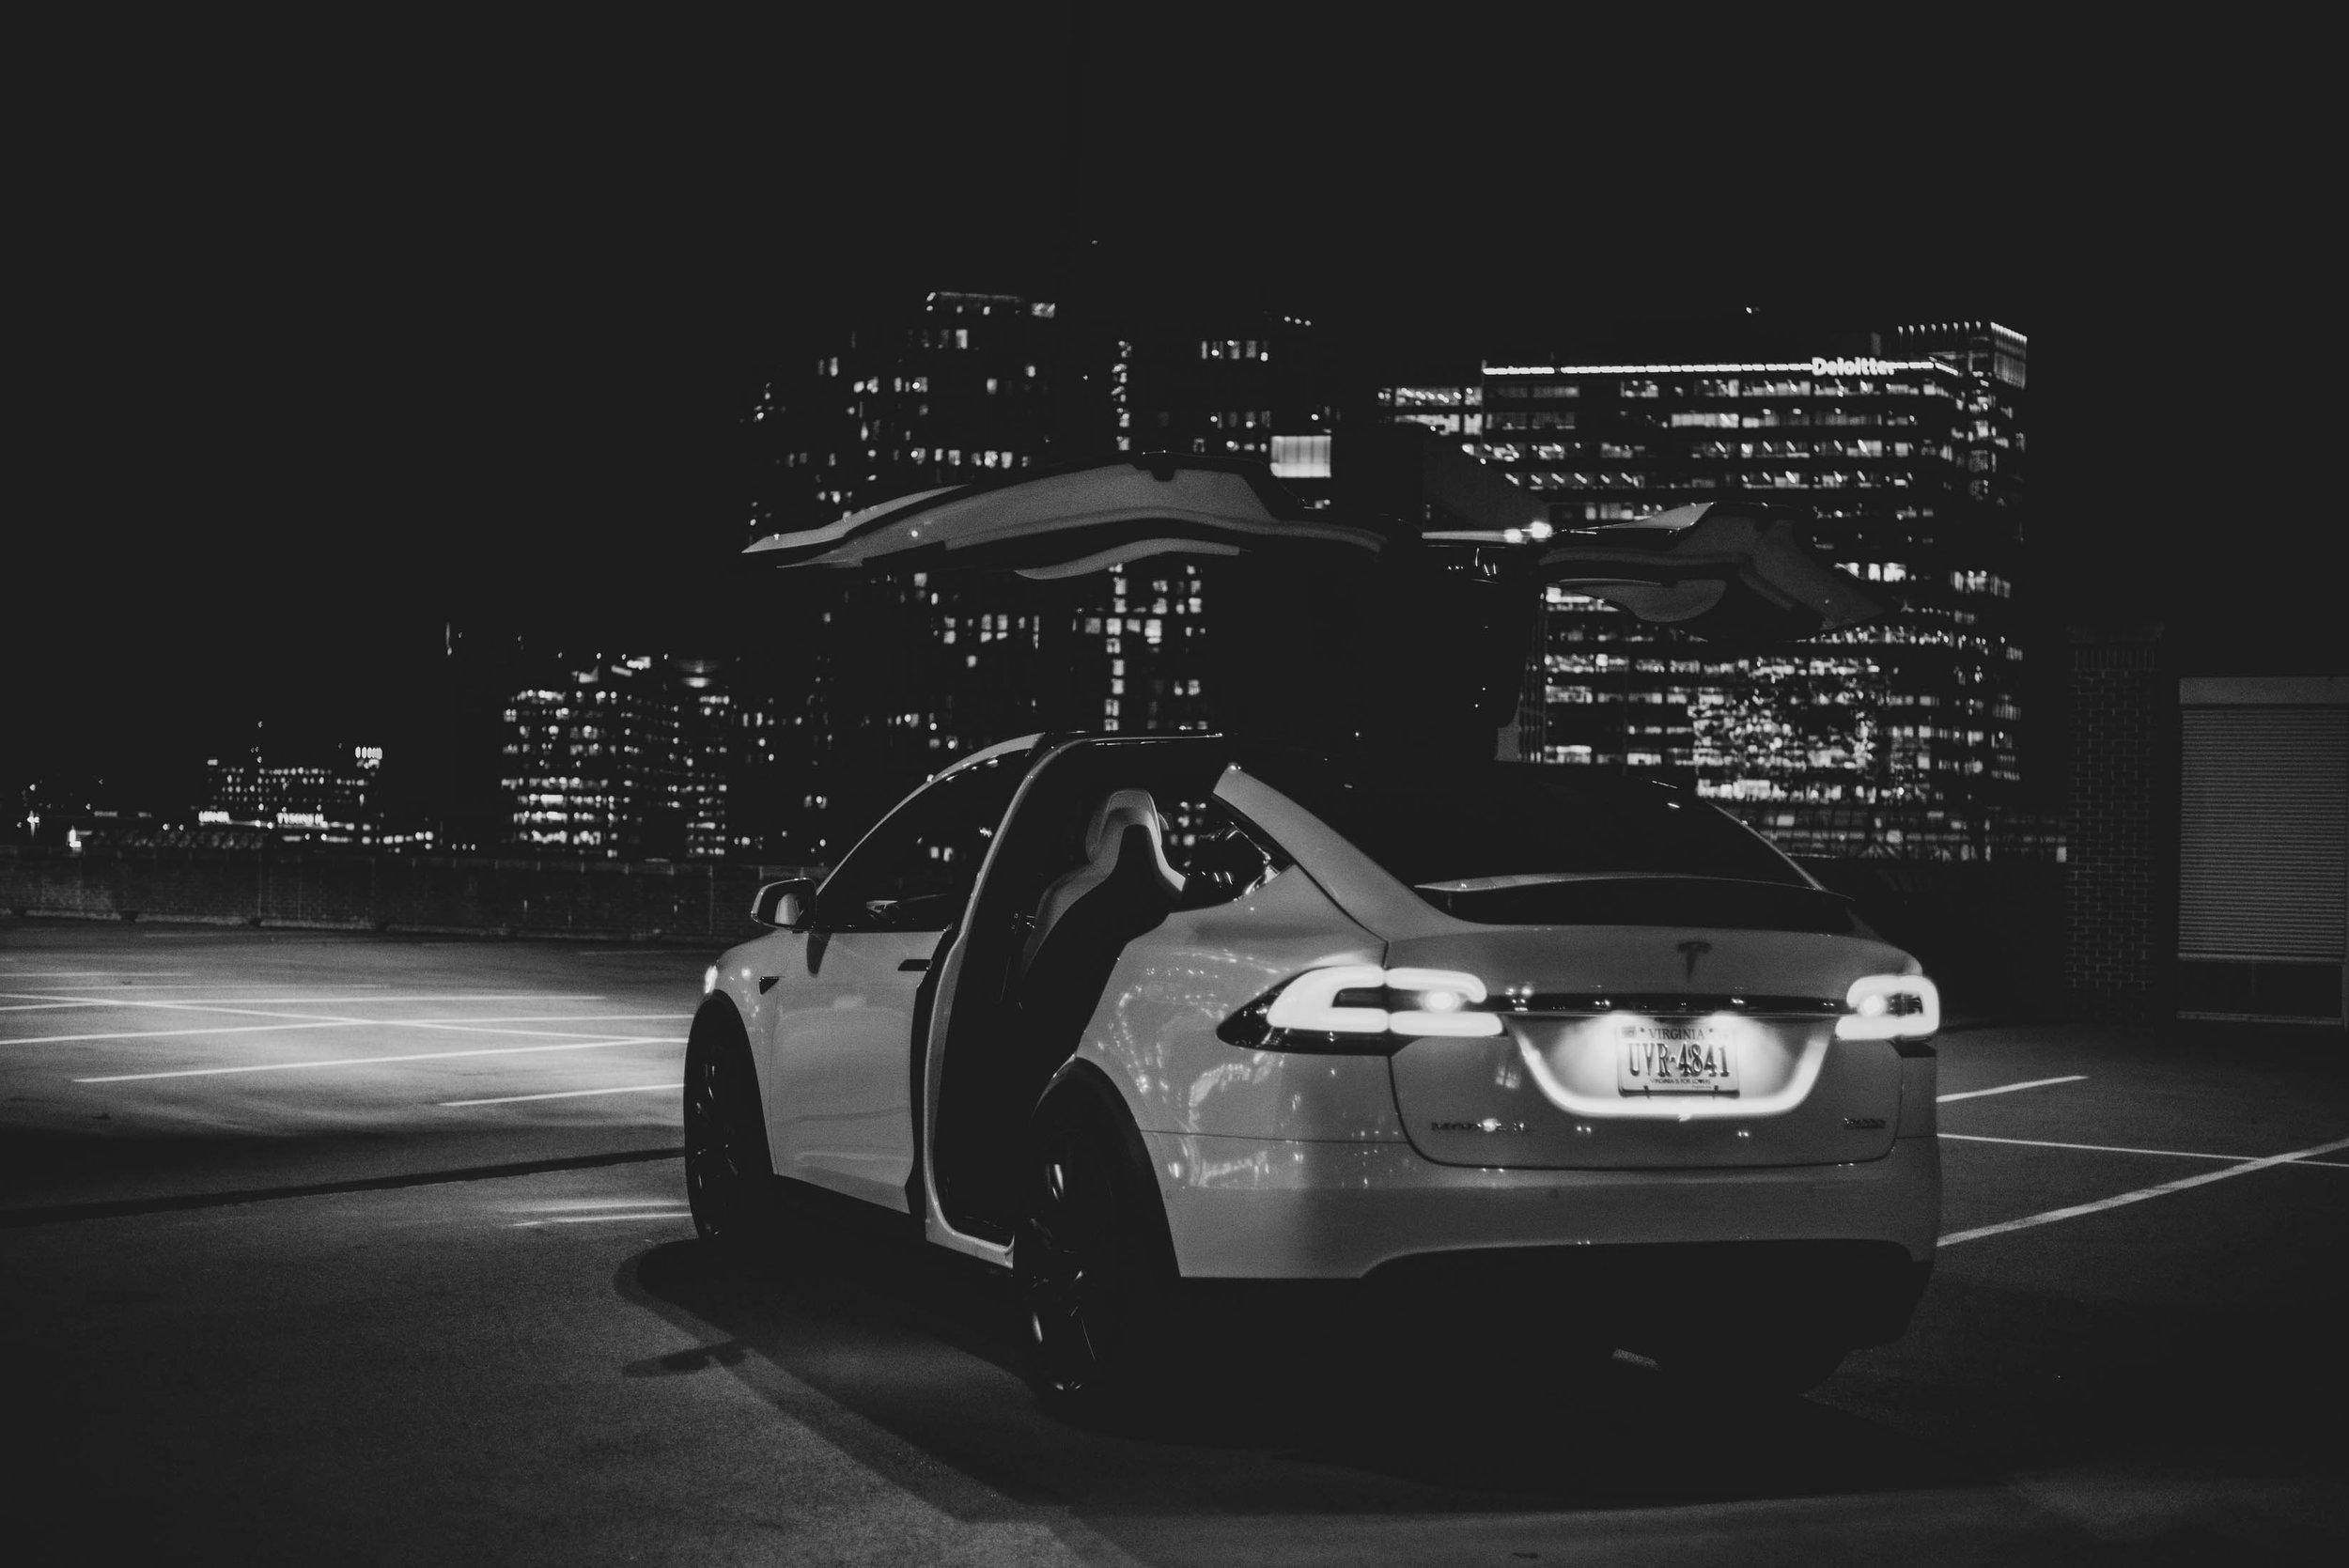 fleet+vehicle+sexy+car+photo+video+speed+tesla+p100d+vadym+guliuk+photography-3.jpg